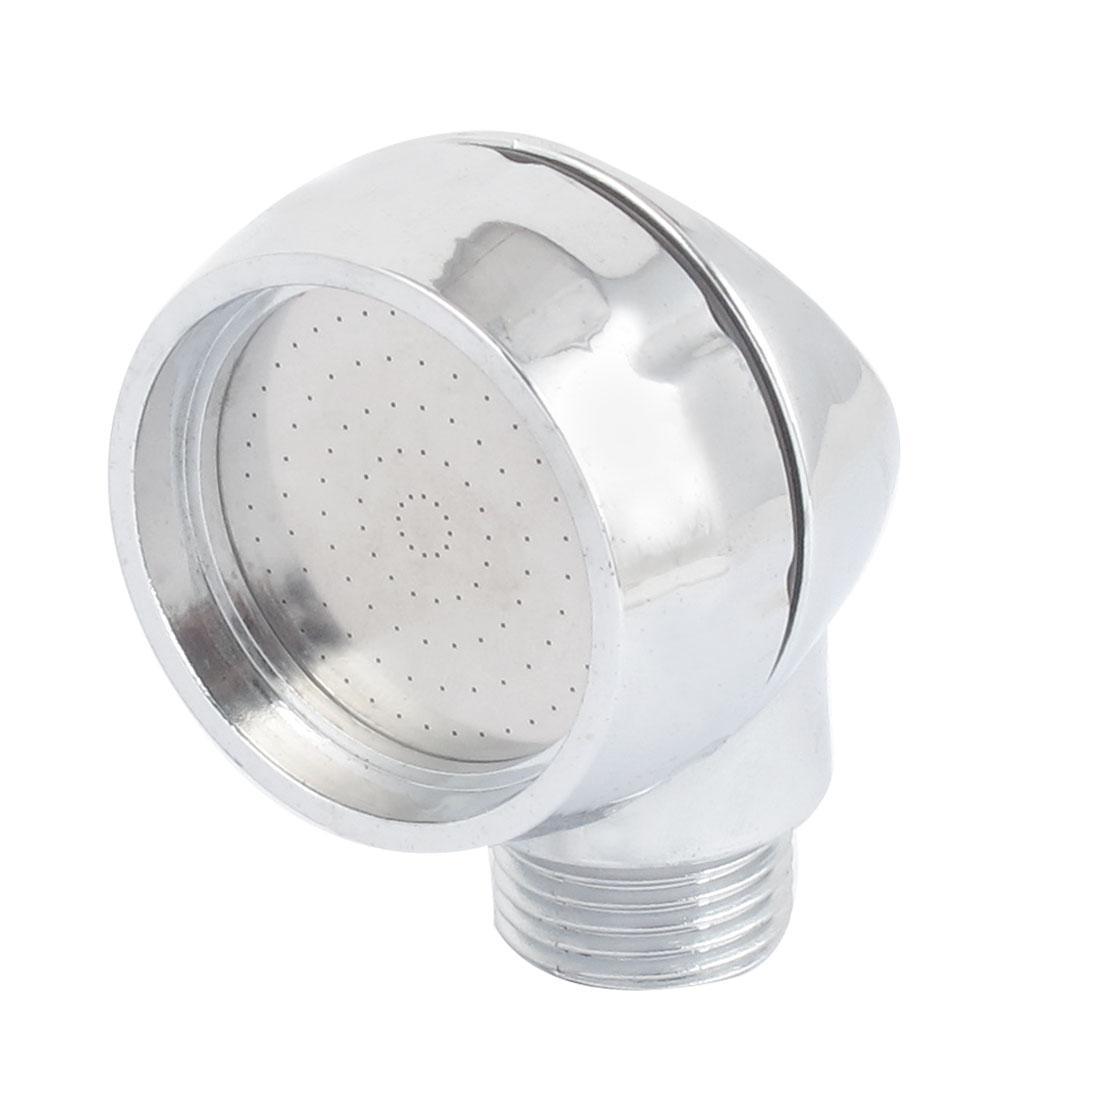 Silver Tone 20mm Thread Water Saving Bathroom Hand Held Bath Shower Head